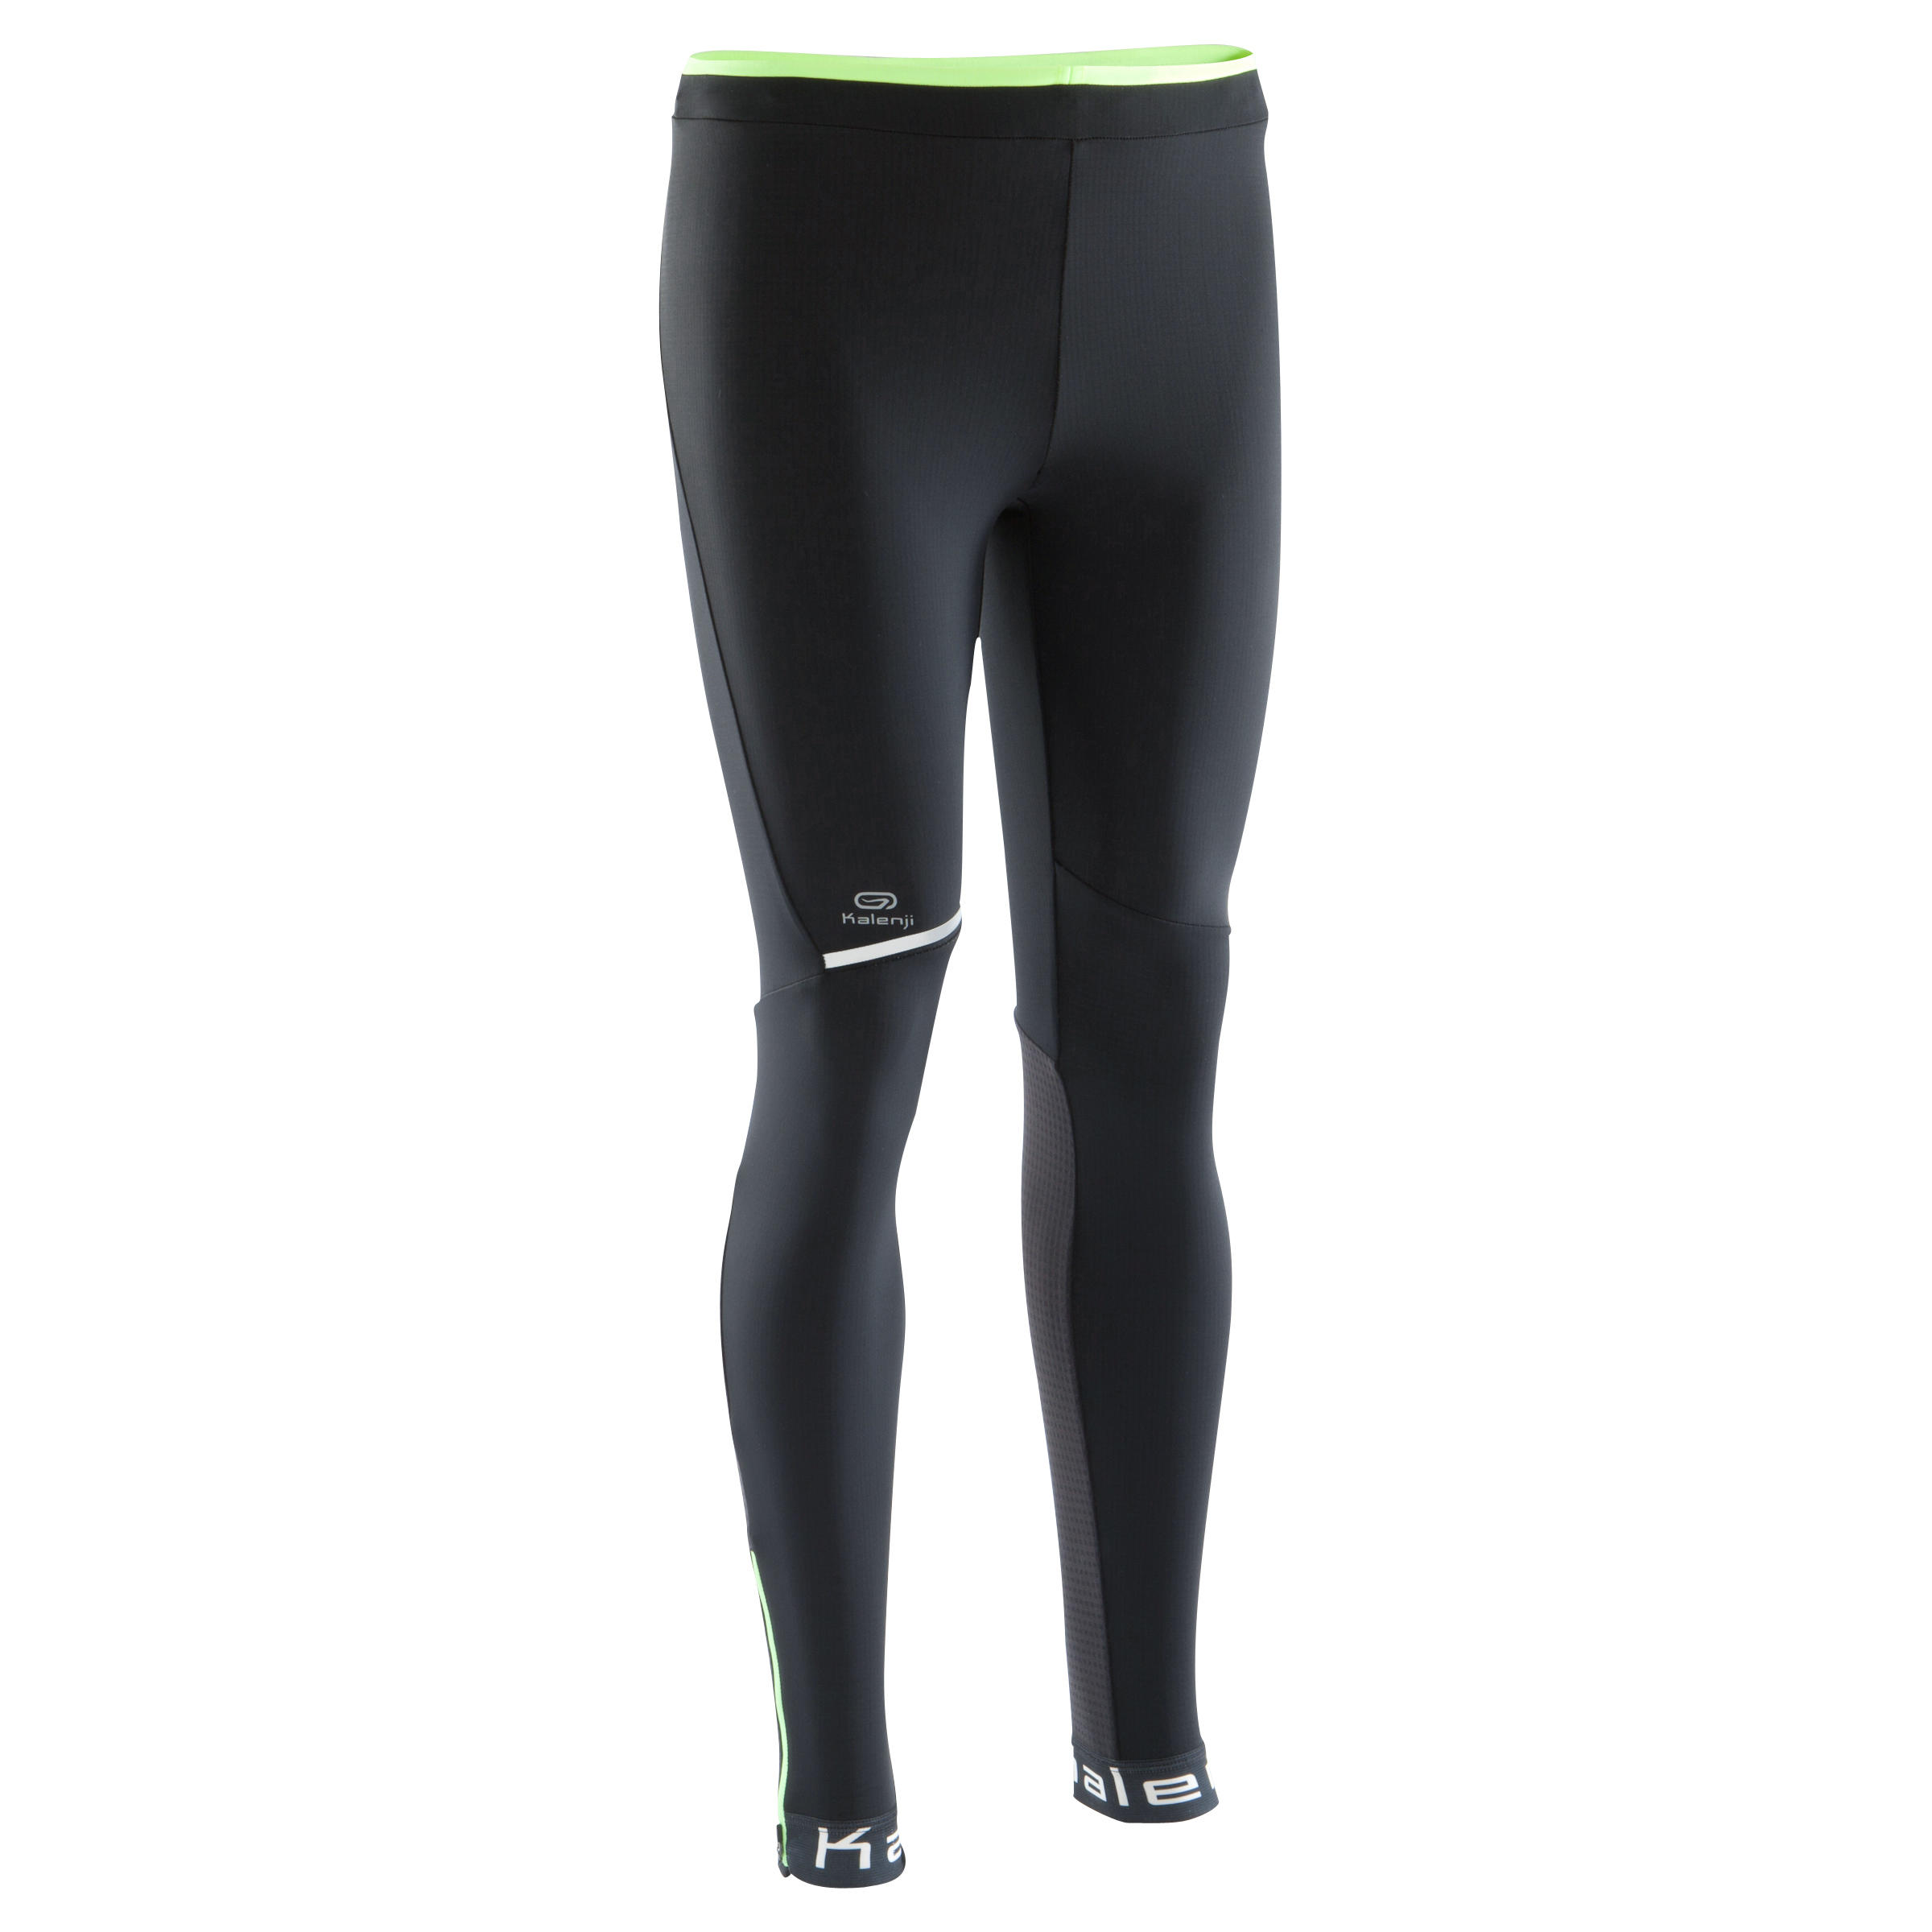 Kiprun Warm Men's Running Tights - Black/Yellow